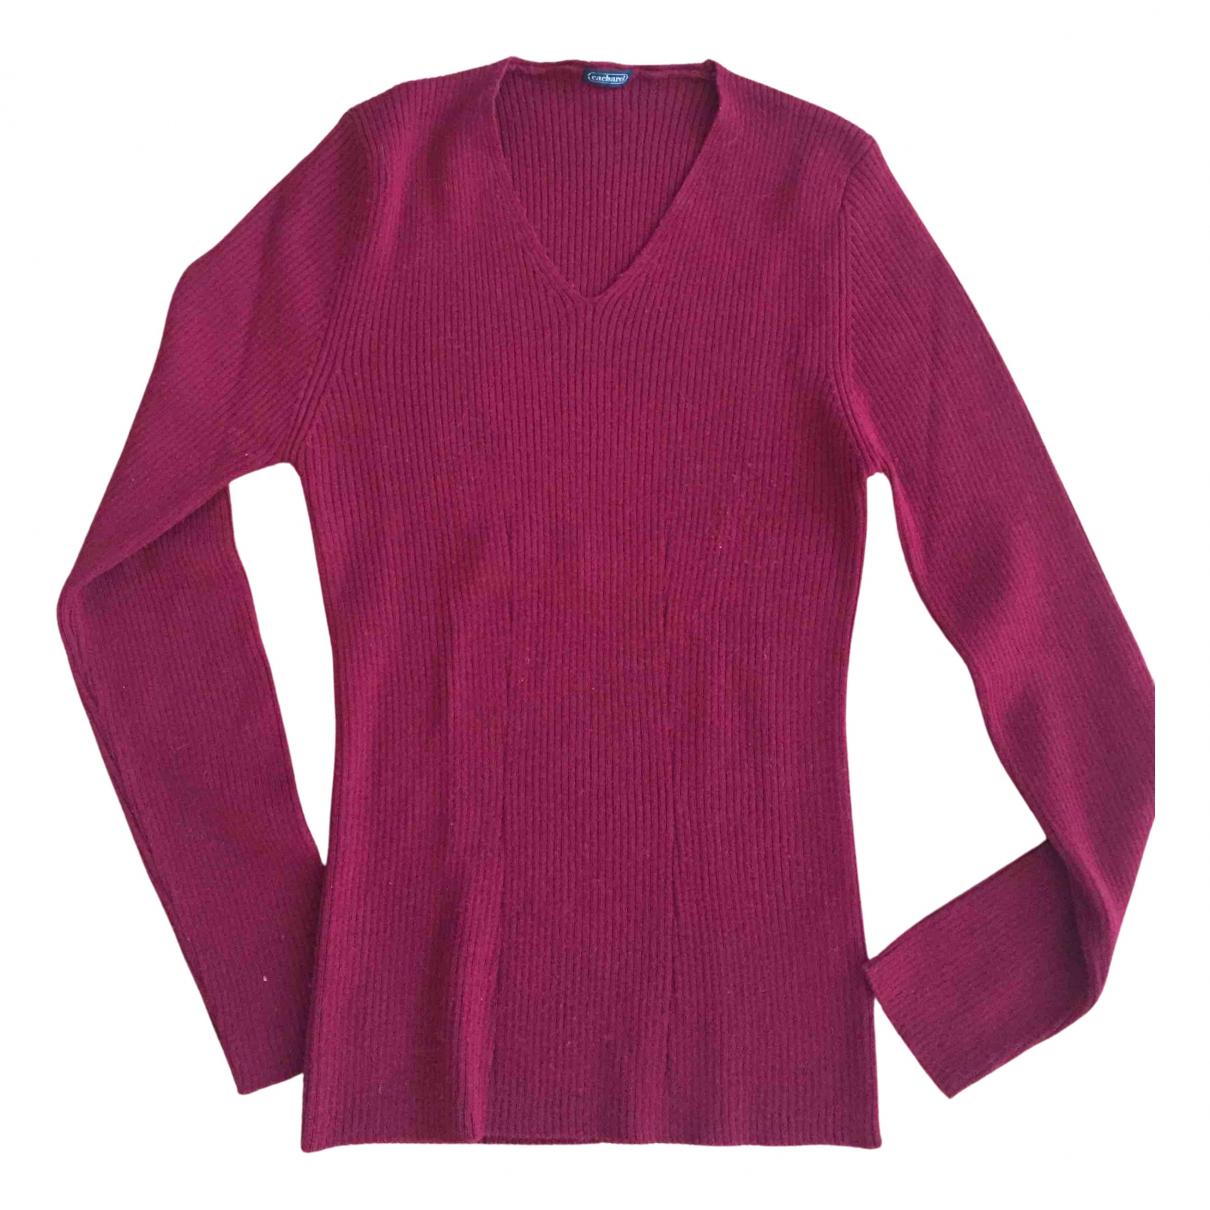 Cacharel N Red Wool Knitwear for Women S International